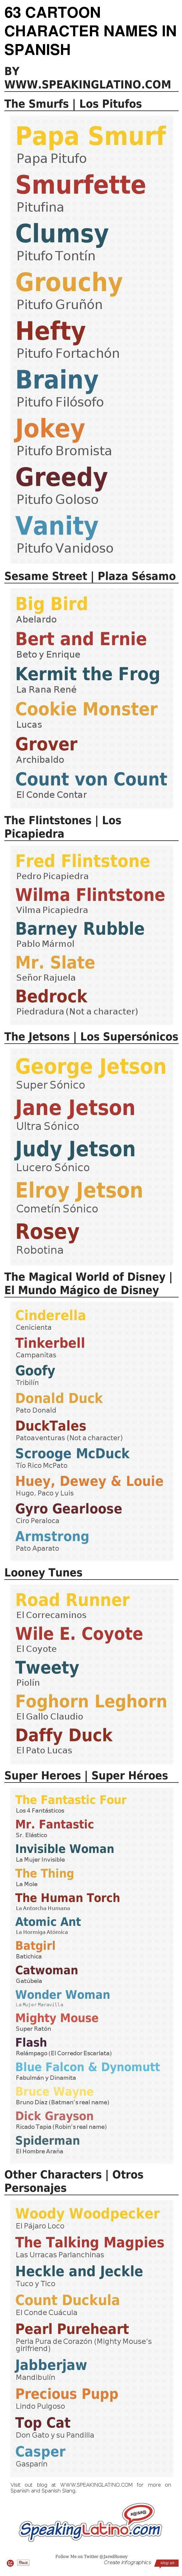 Infographic: 63 Cartoon Character English Names in Spanish #Infographic #Cartoons #Spanish via http://www.speakinglatino.com/classic-cartoon-character-names-in-spanish/